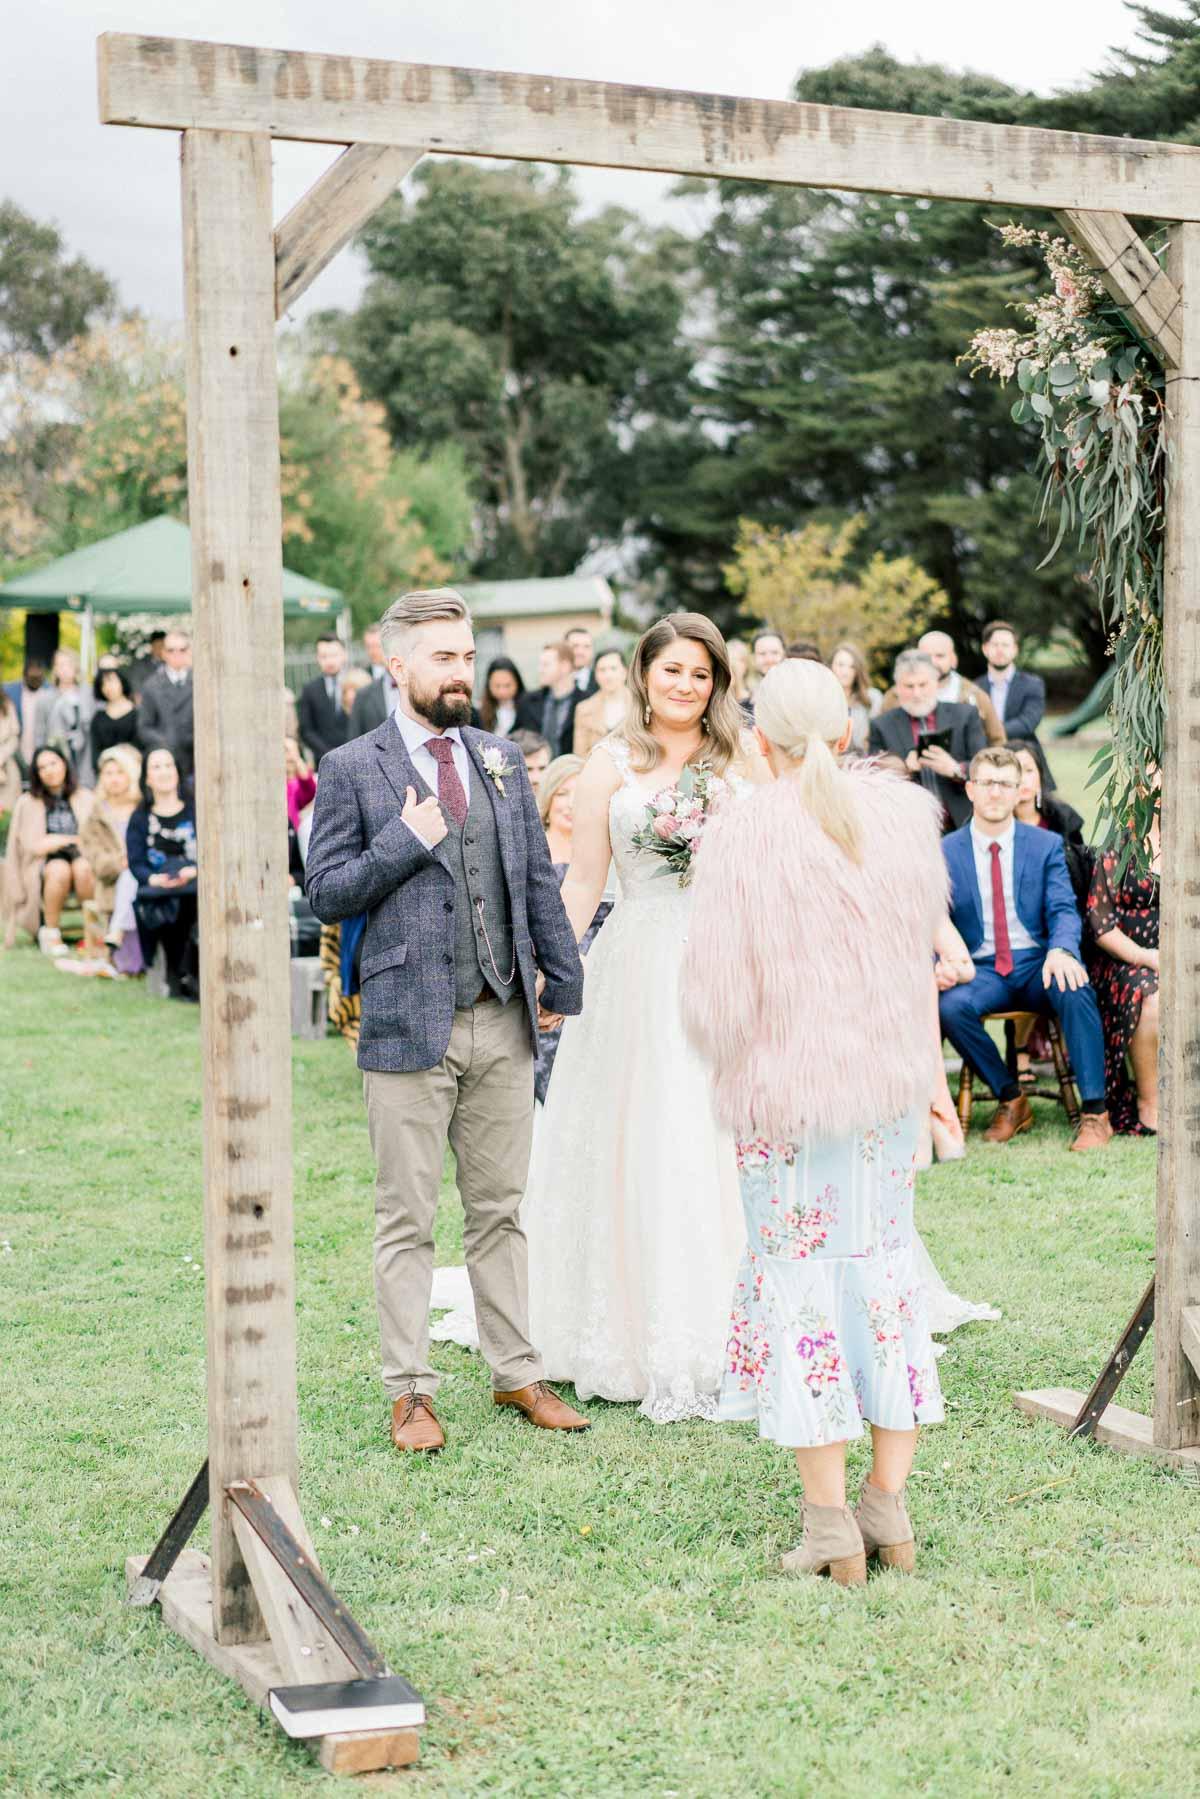 adams-farm-coldstream-yarra-valley-wedding-heart+soul-weddings-kel-jarryd-04852.jpg